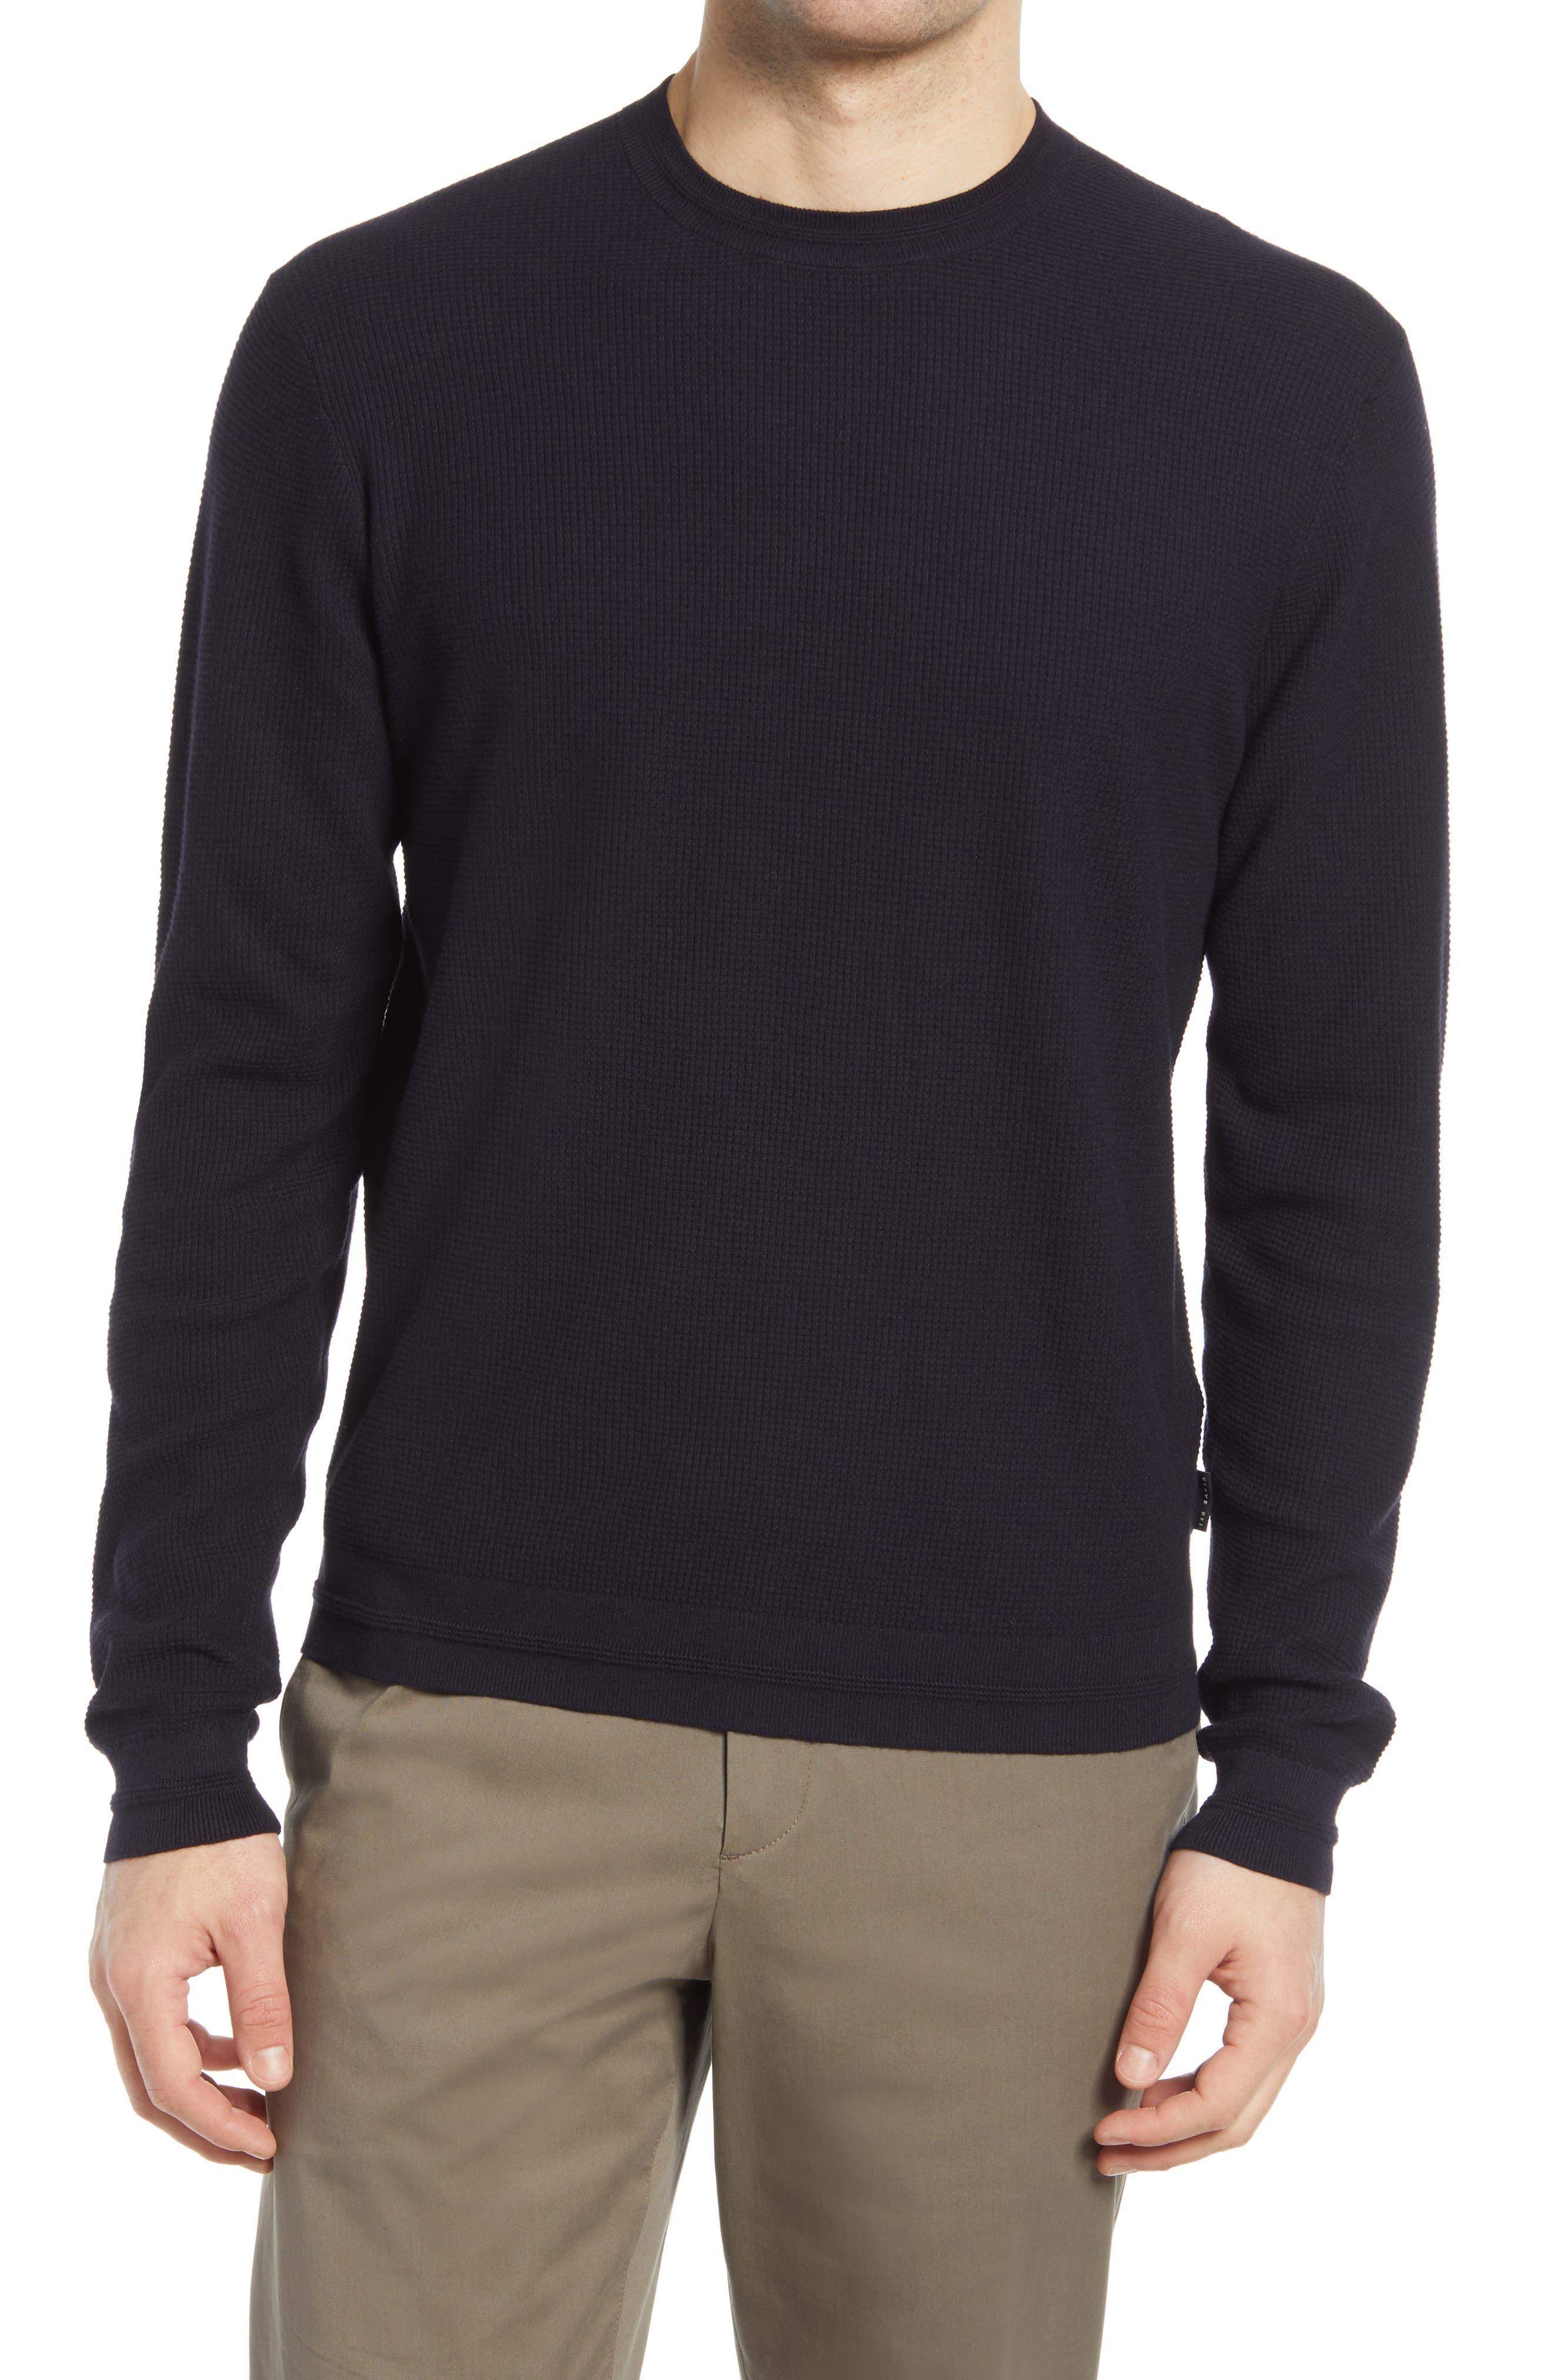 BNWT Ted Baker Mens Jumper Mond Size 6// Size XxLarge Colour Charcoal Grey XXL